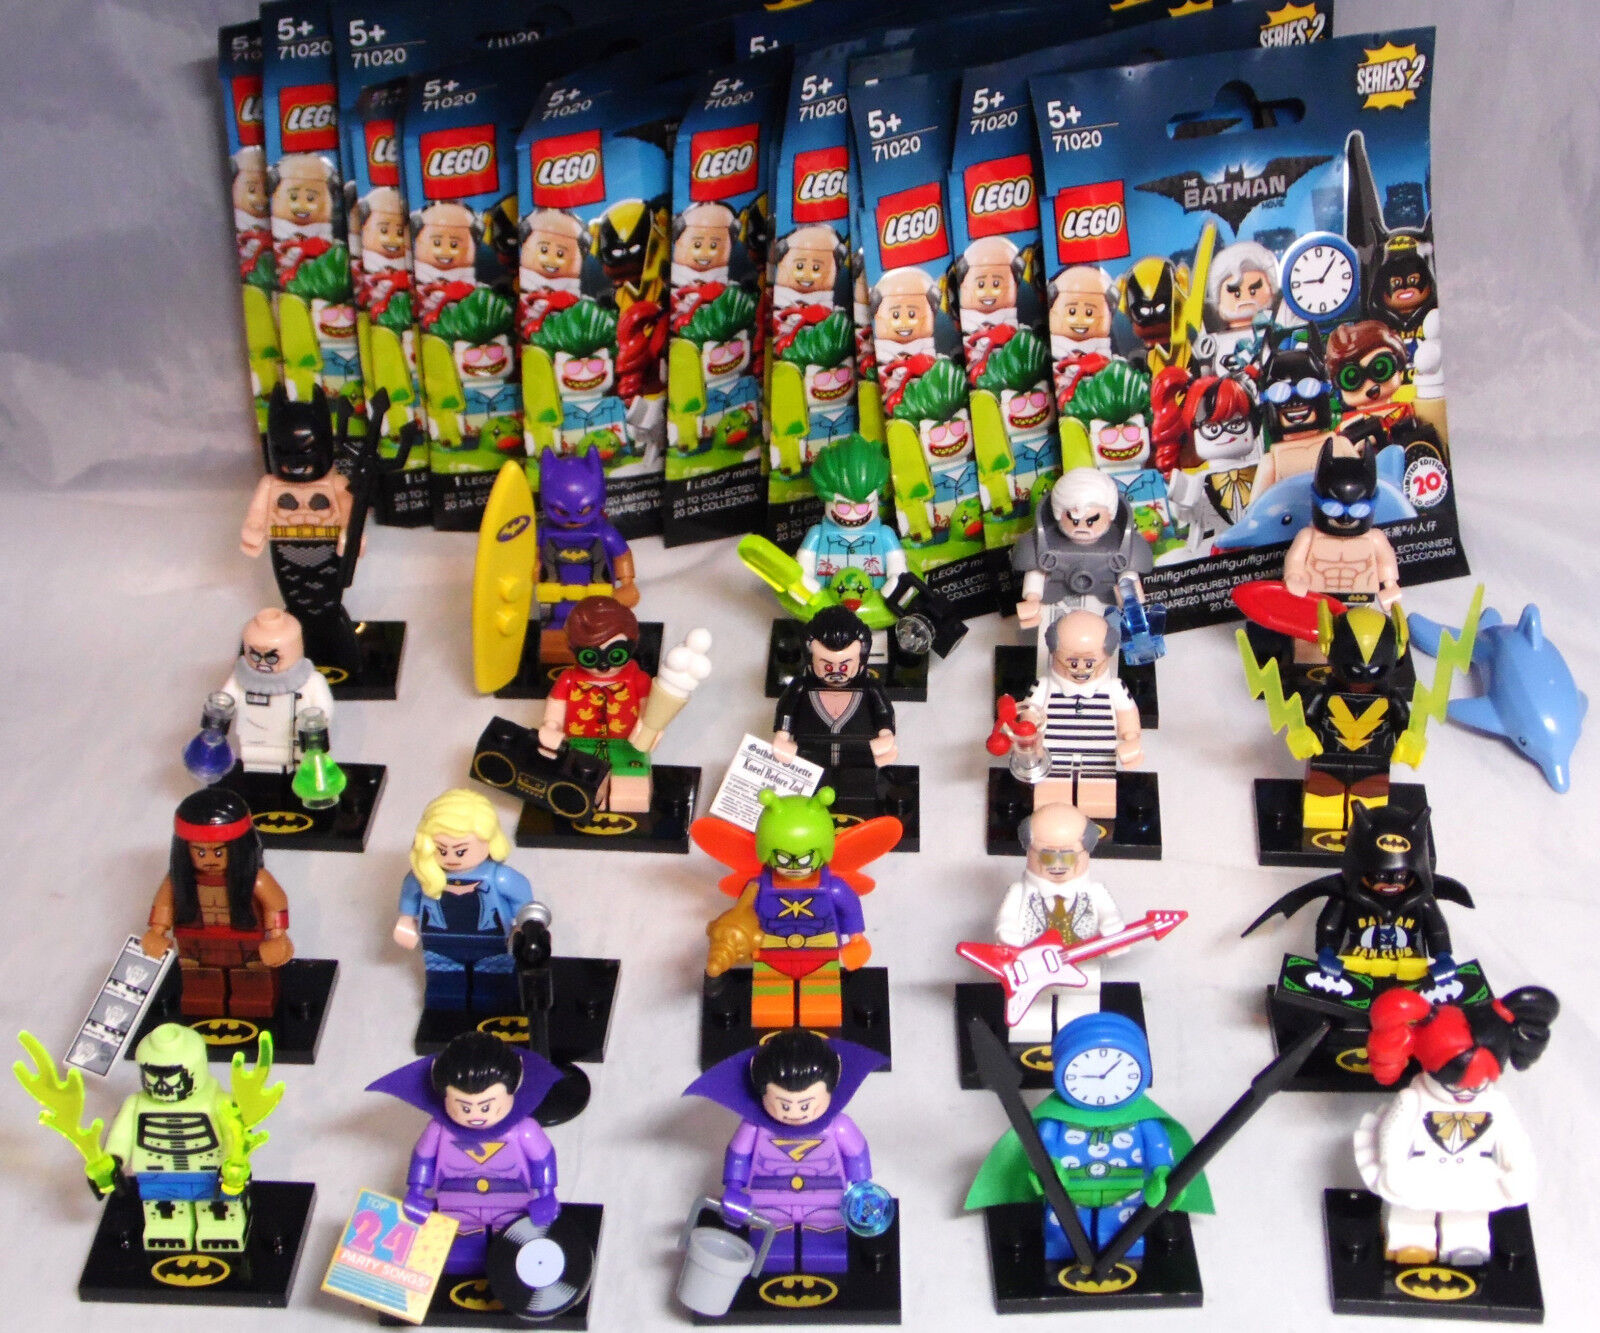 LEGO 71020 Minfiguren The Batman Movie Serie 2, 1 Satz = 20 versch. Figuren NEU